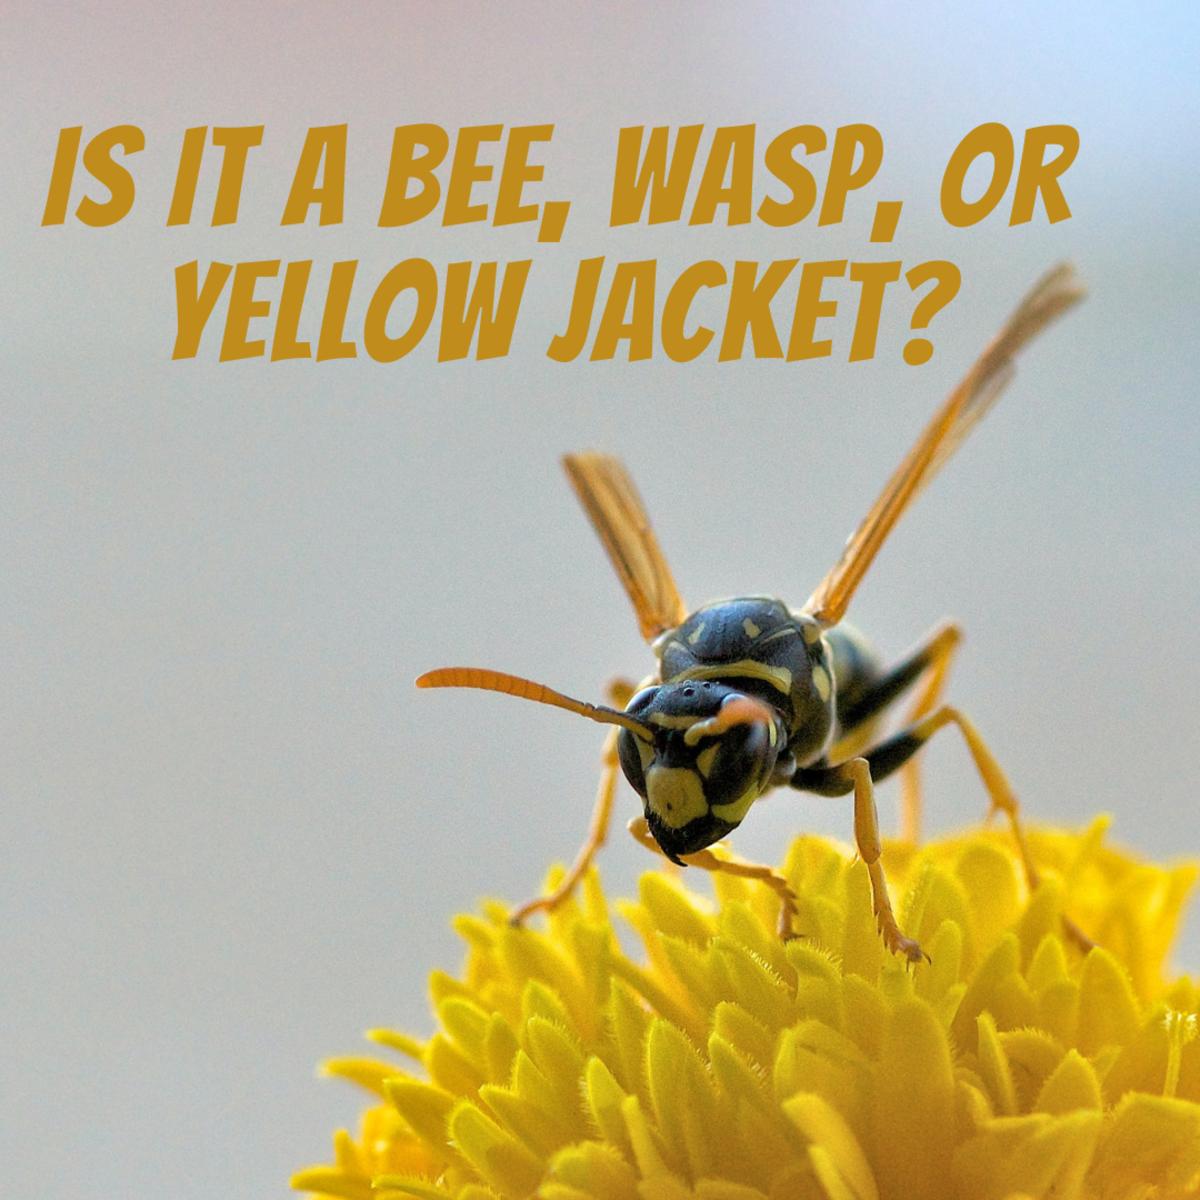 Bee, Wasp, or Yellow Jacket?